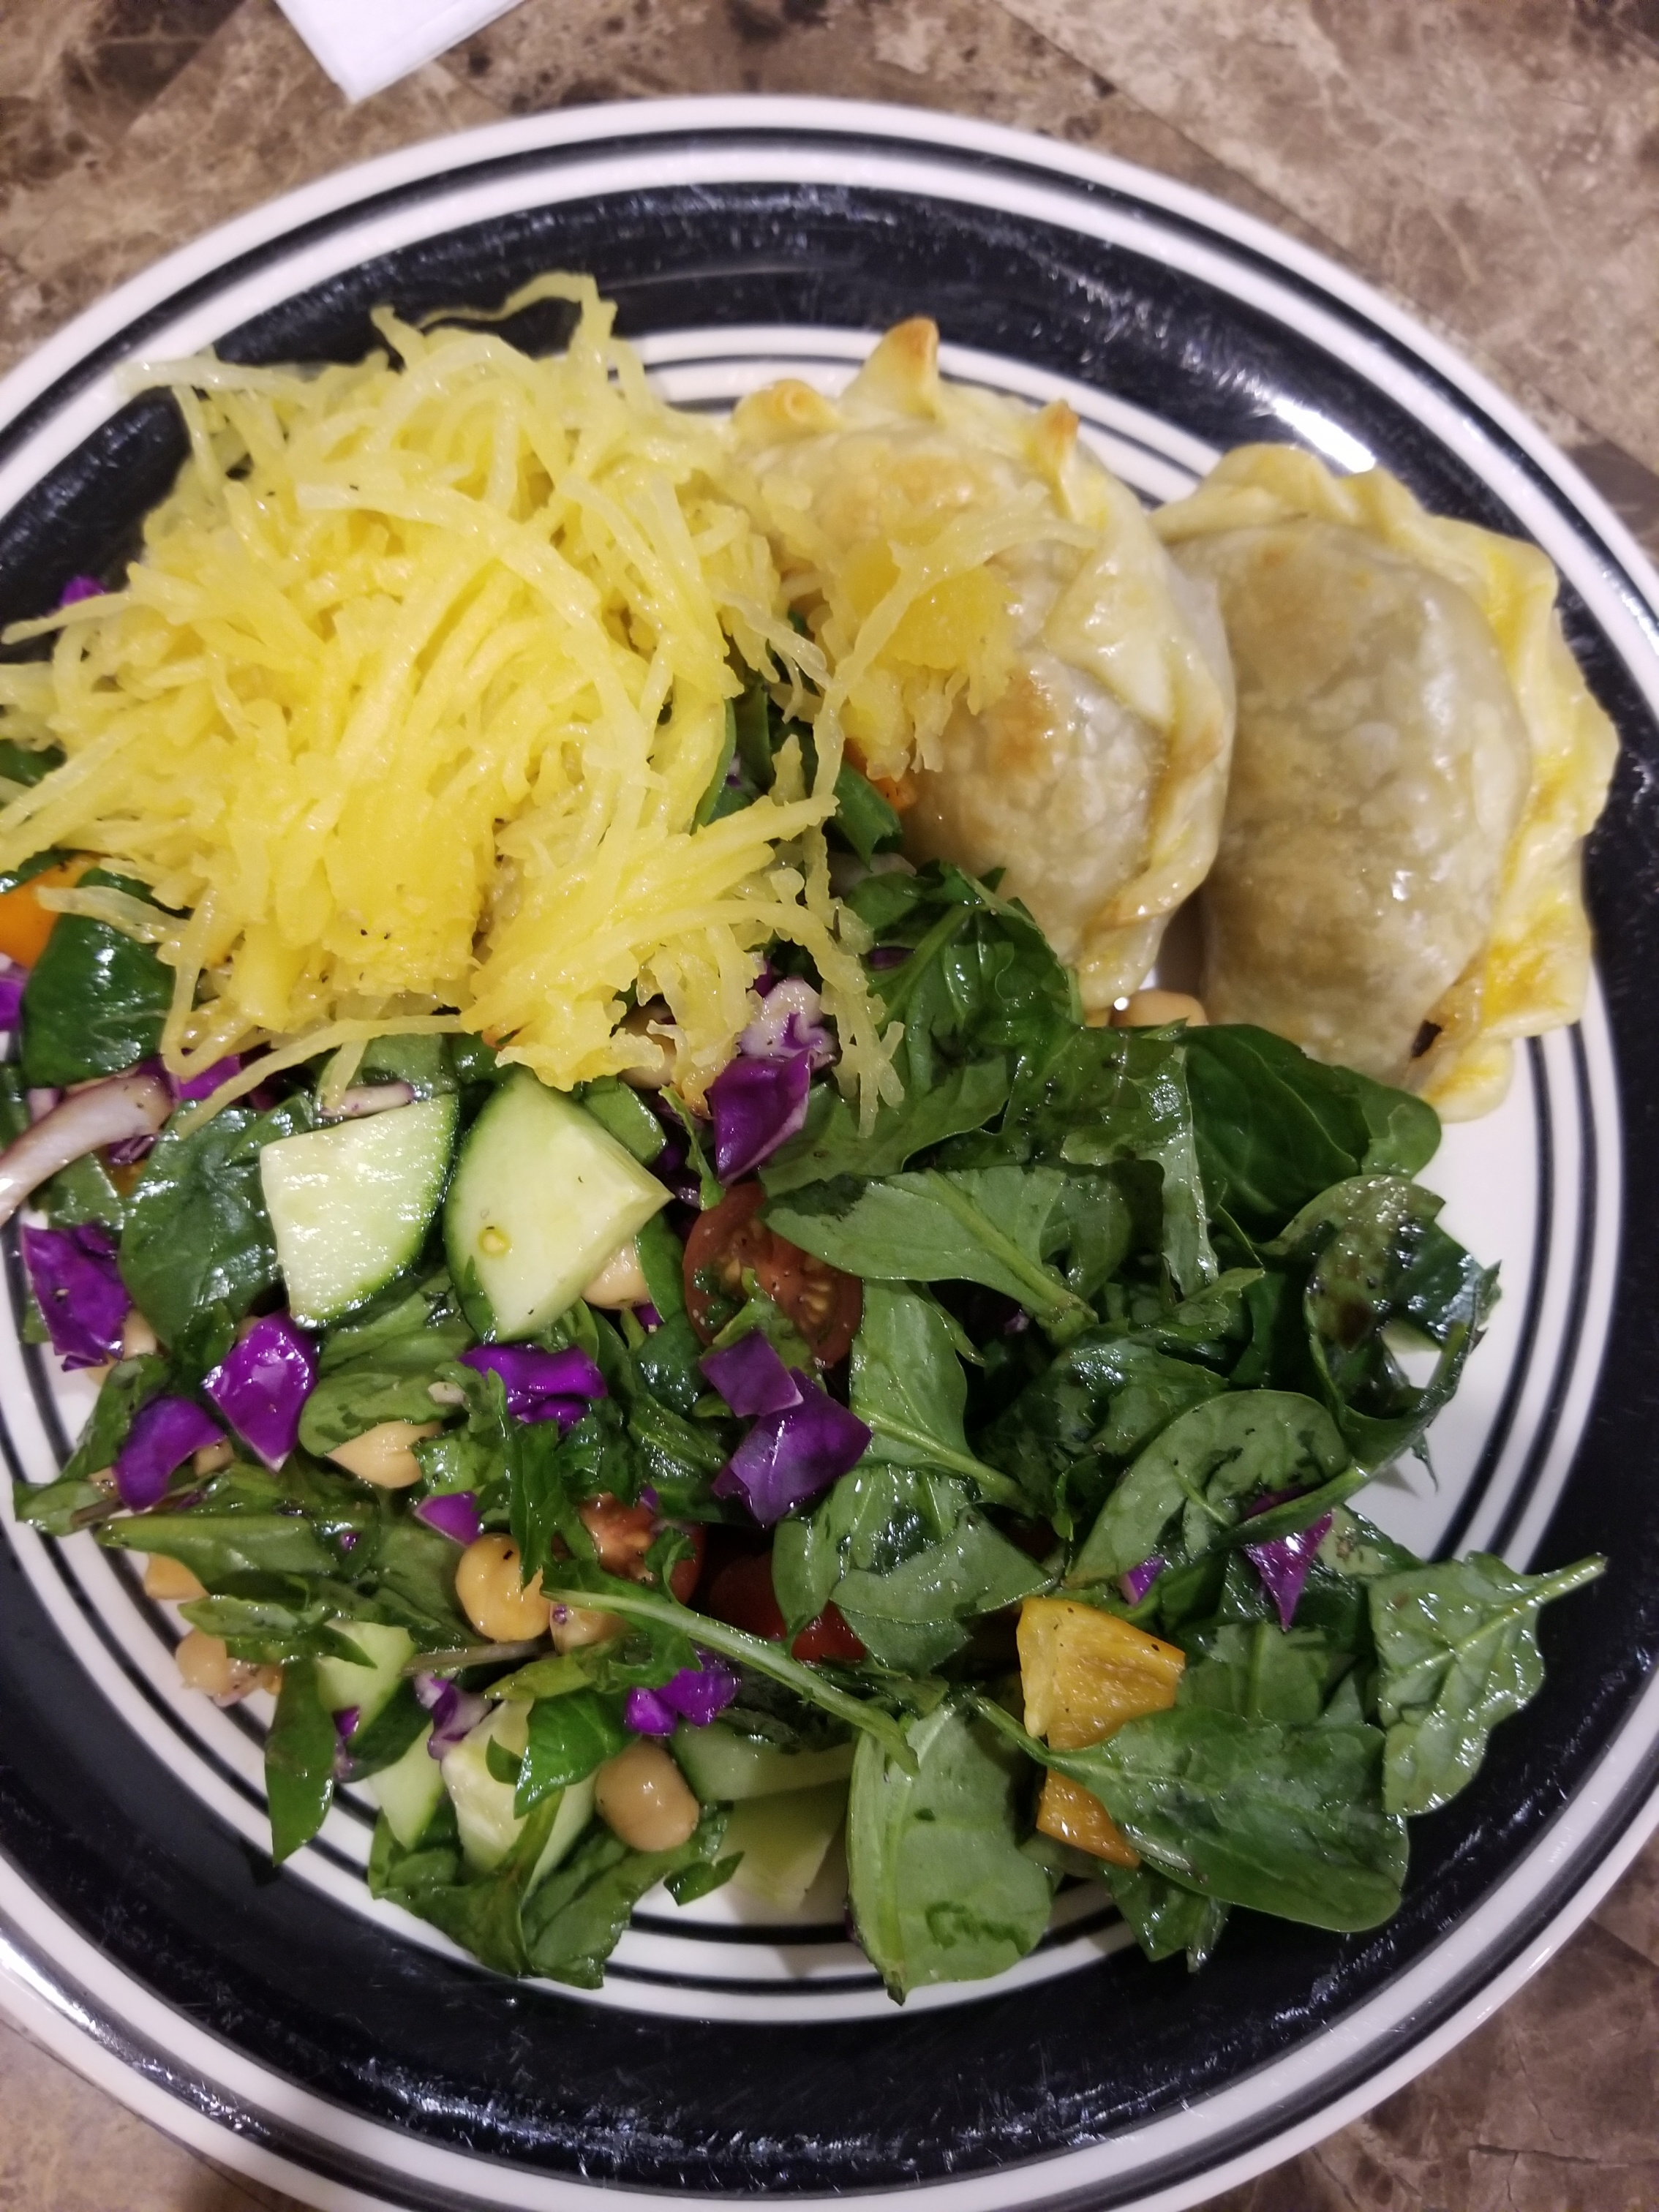 Vegetarian empanadas Argentinian style, spaghetti squash and salad